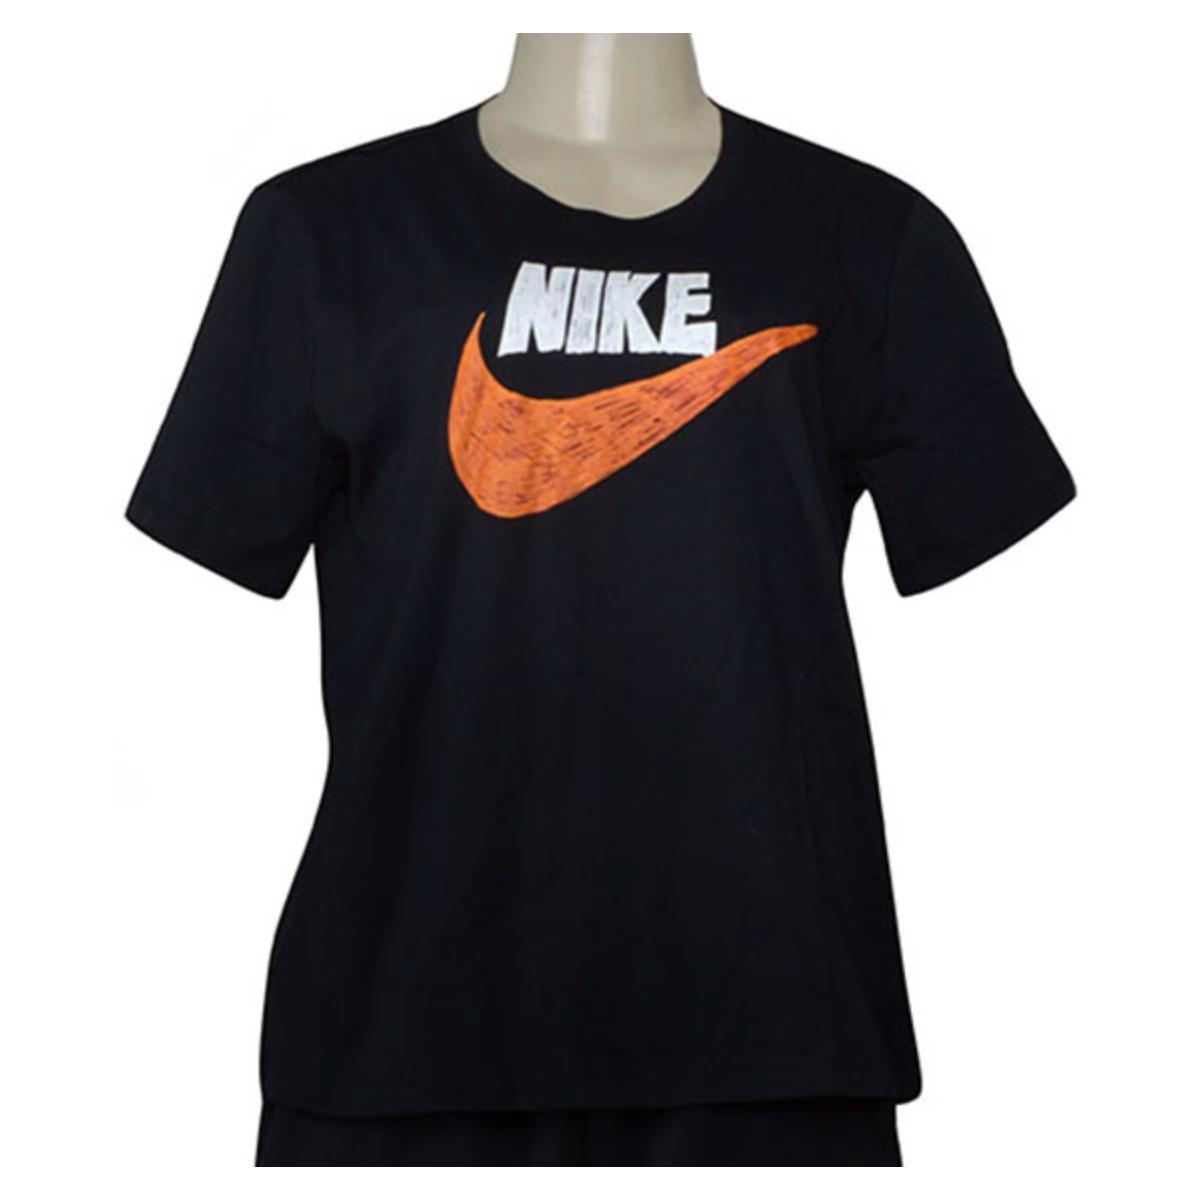 T-shirt Feminino Nike Cj2055-010 Sportswear Preto